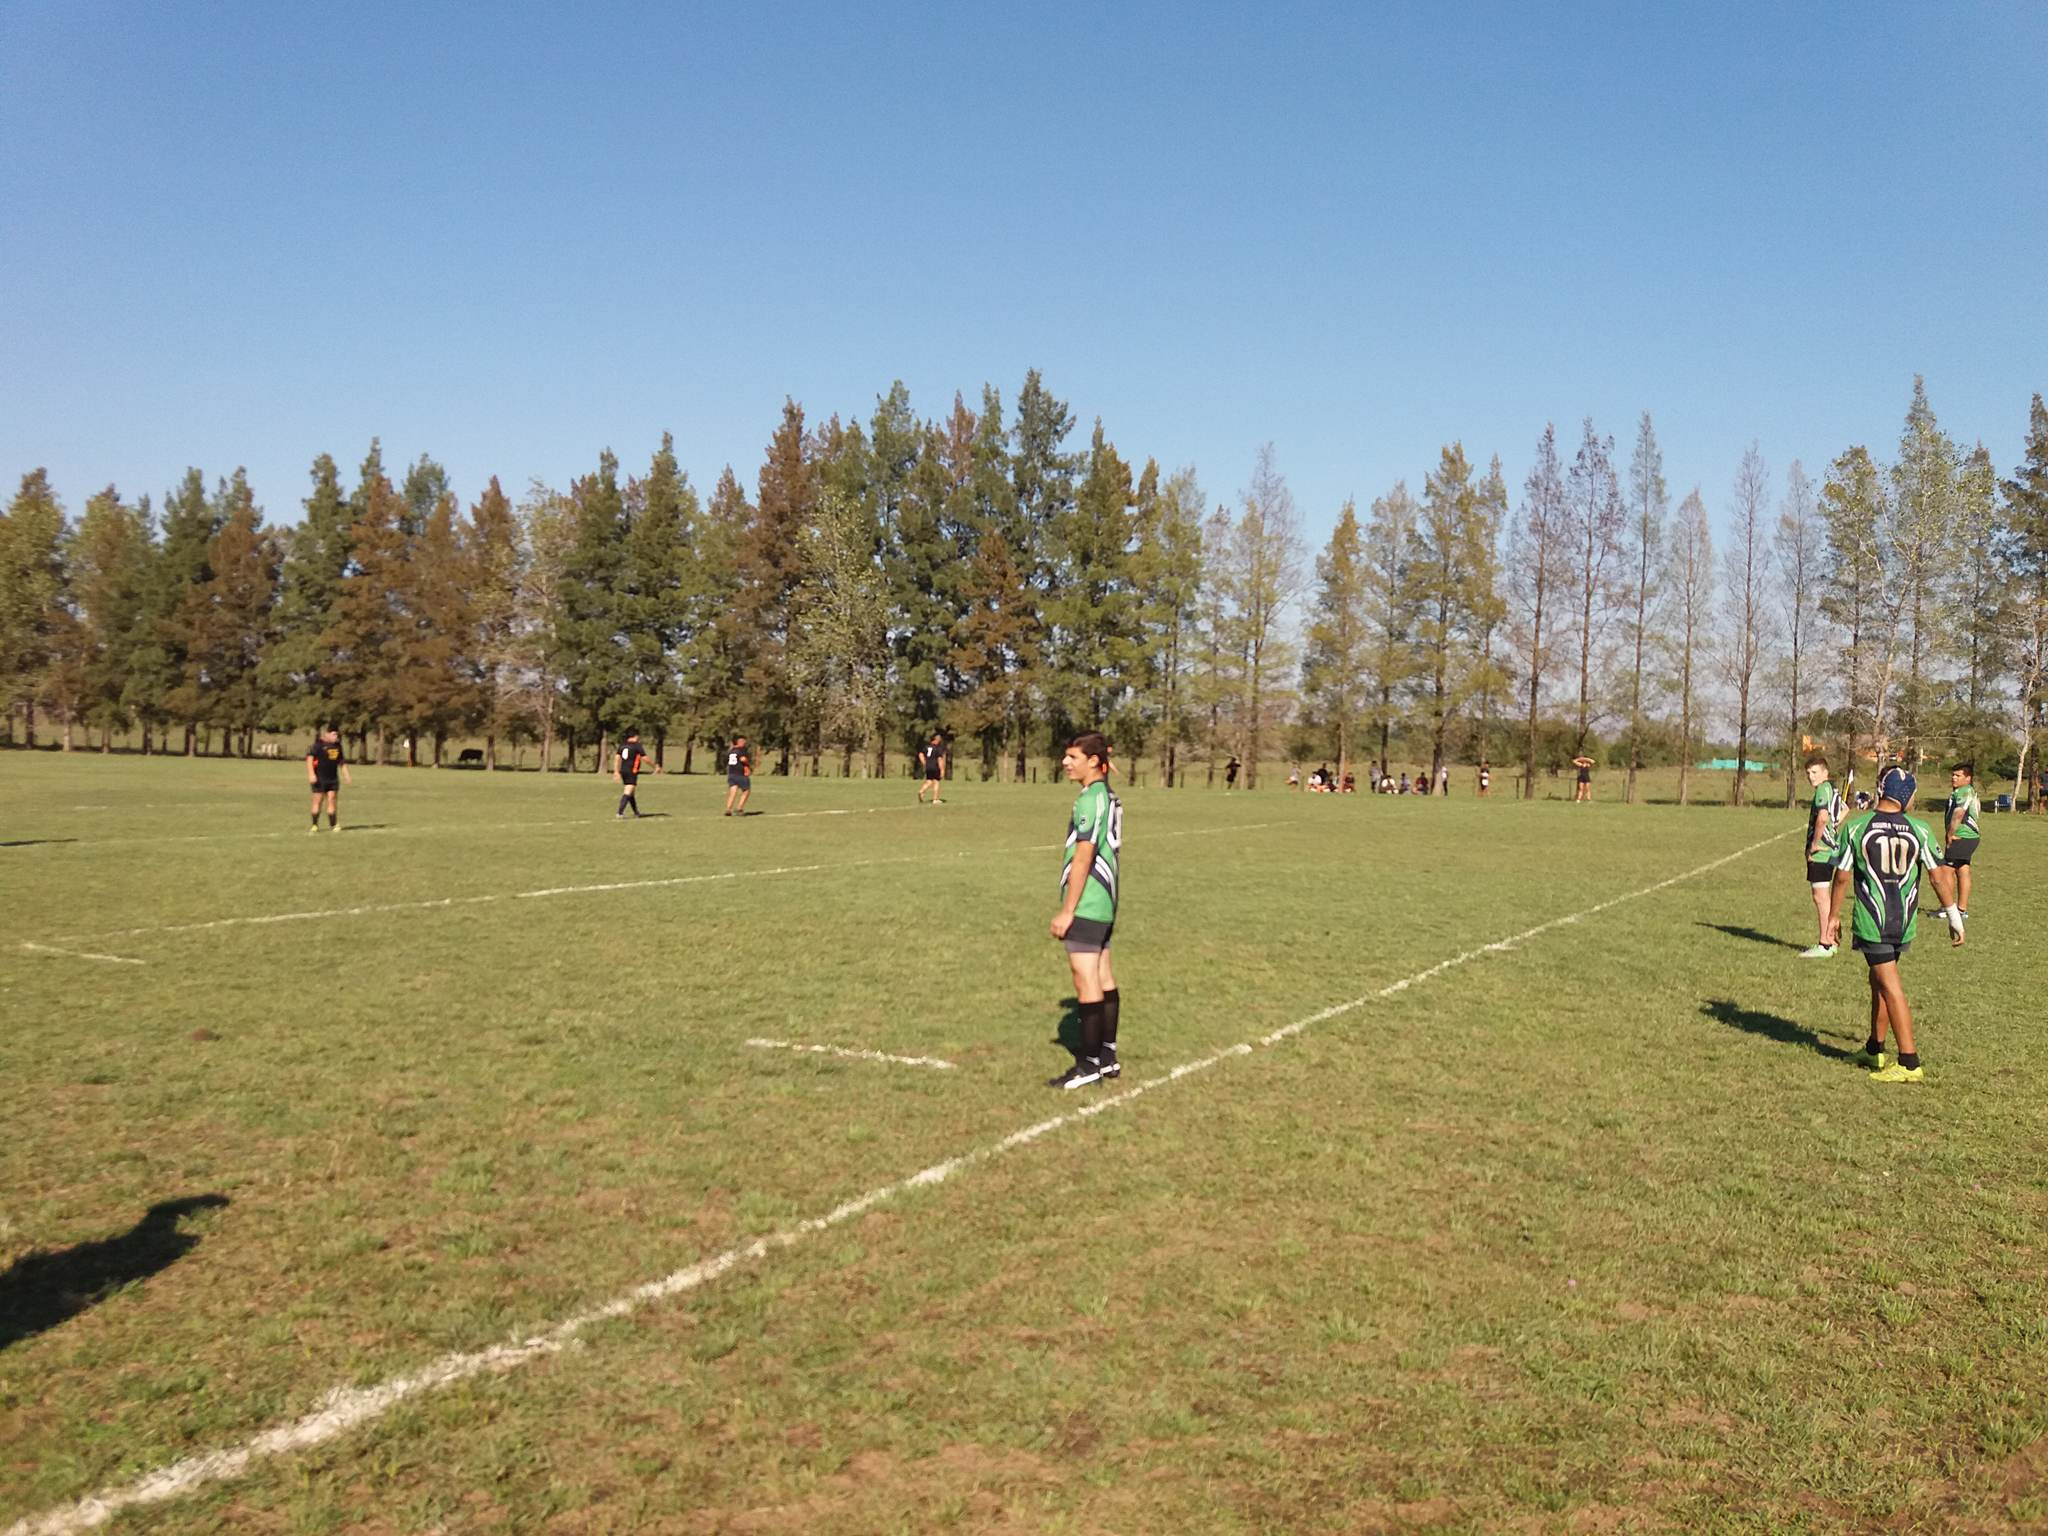 Confederación Argentina de Rugby League release 2018 programme